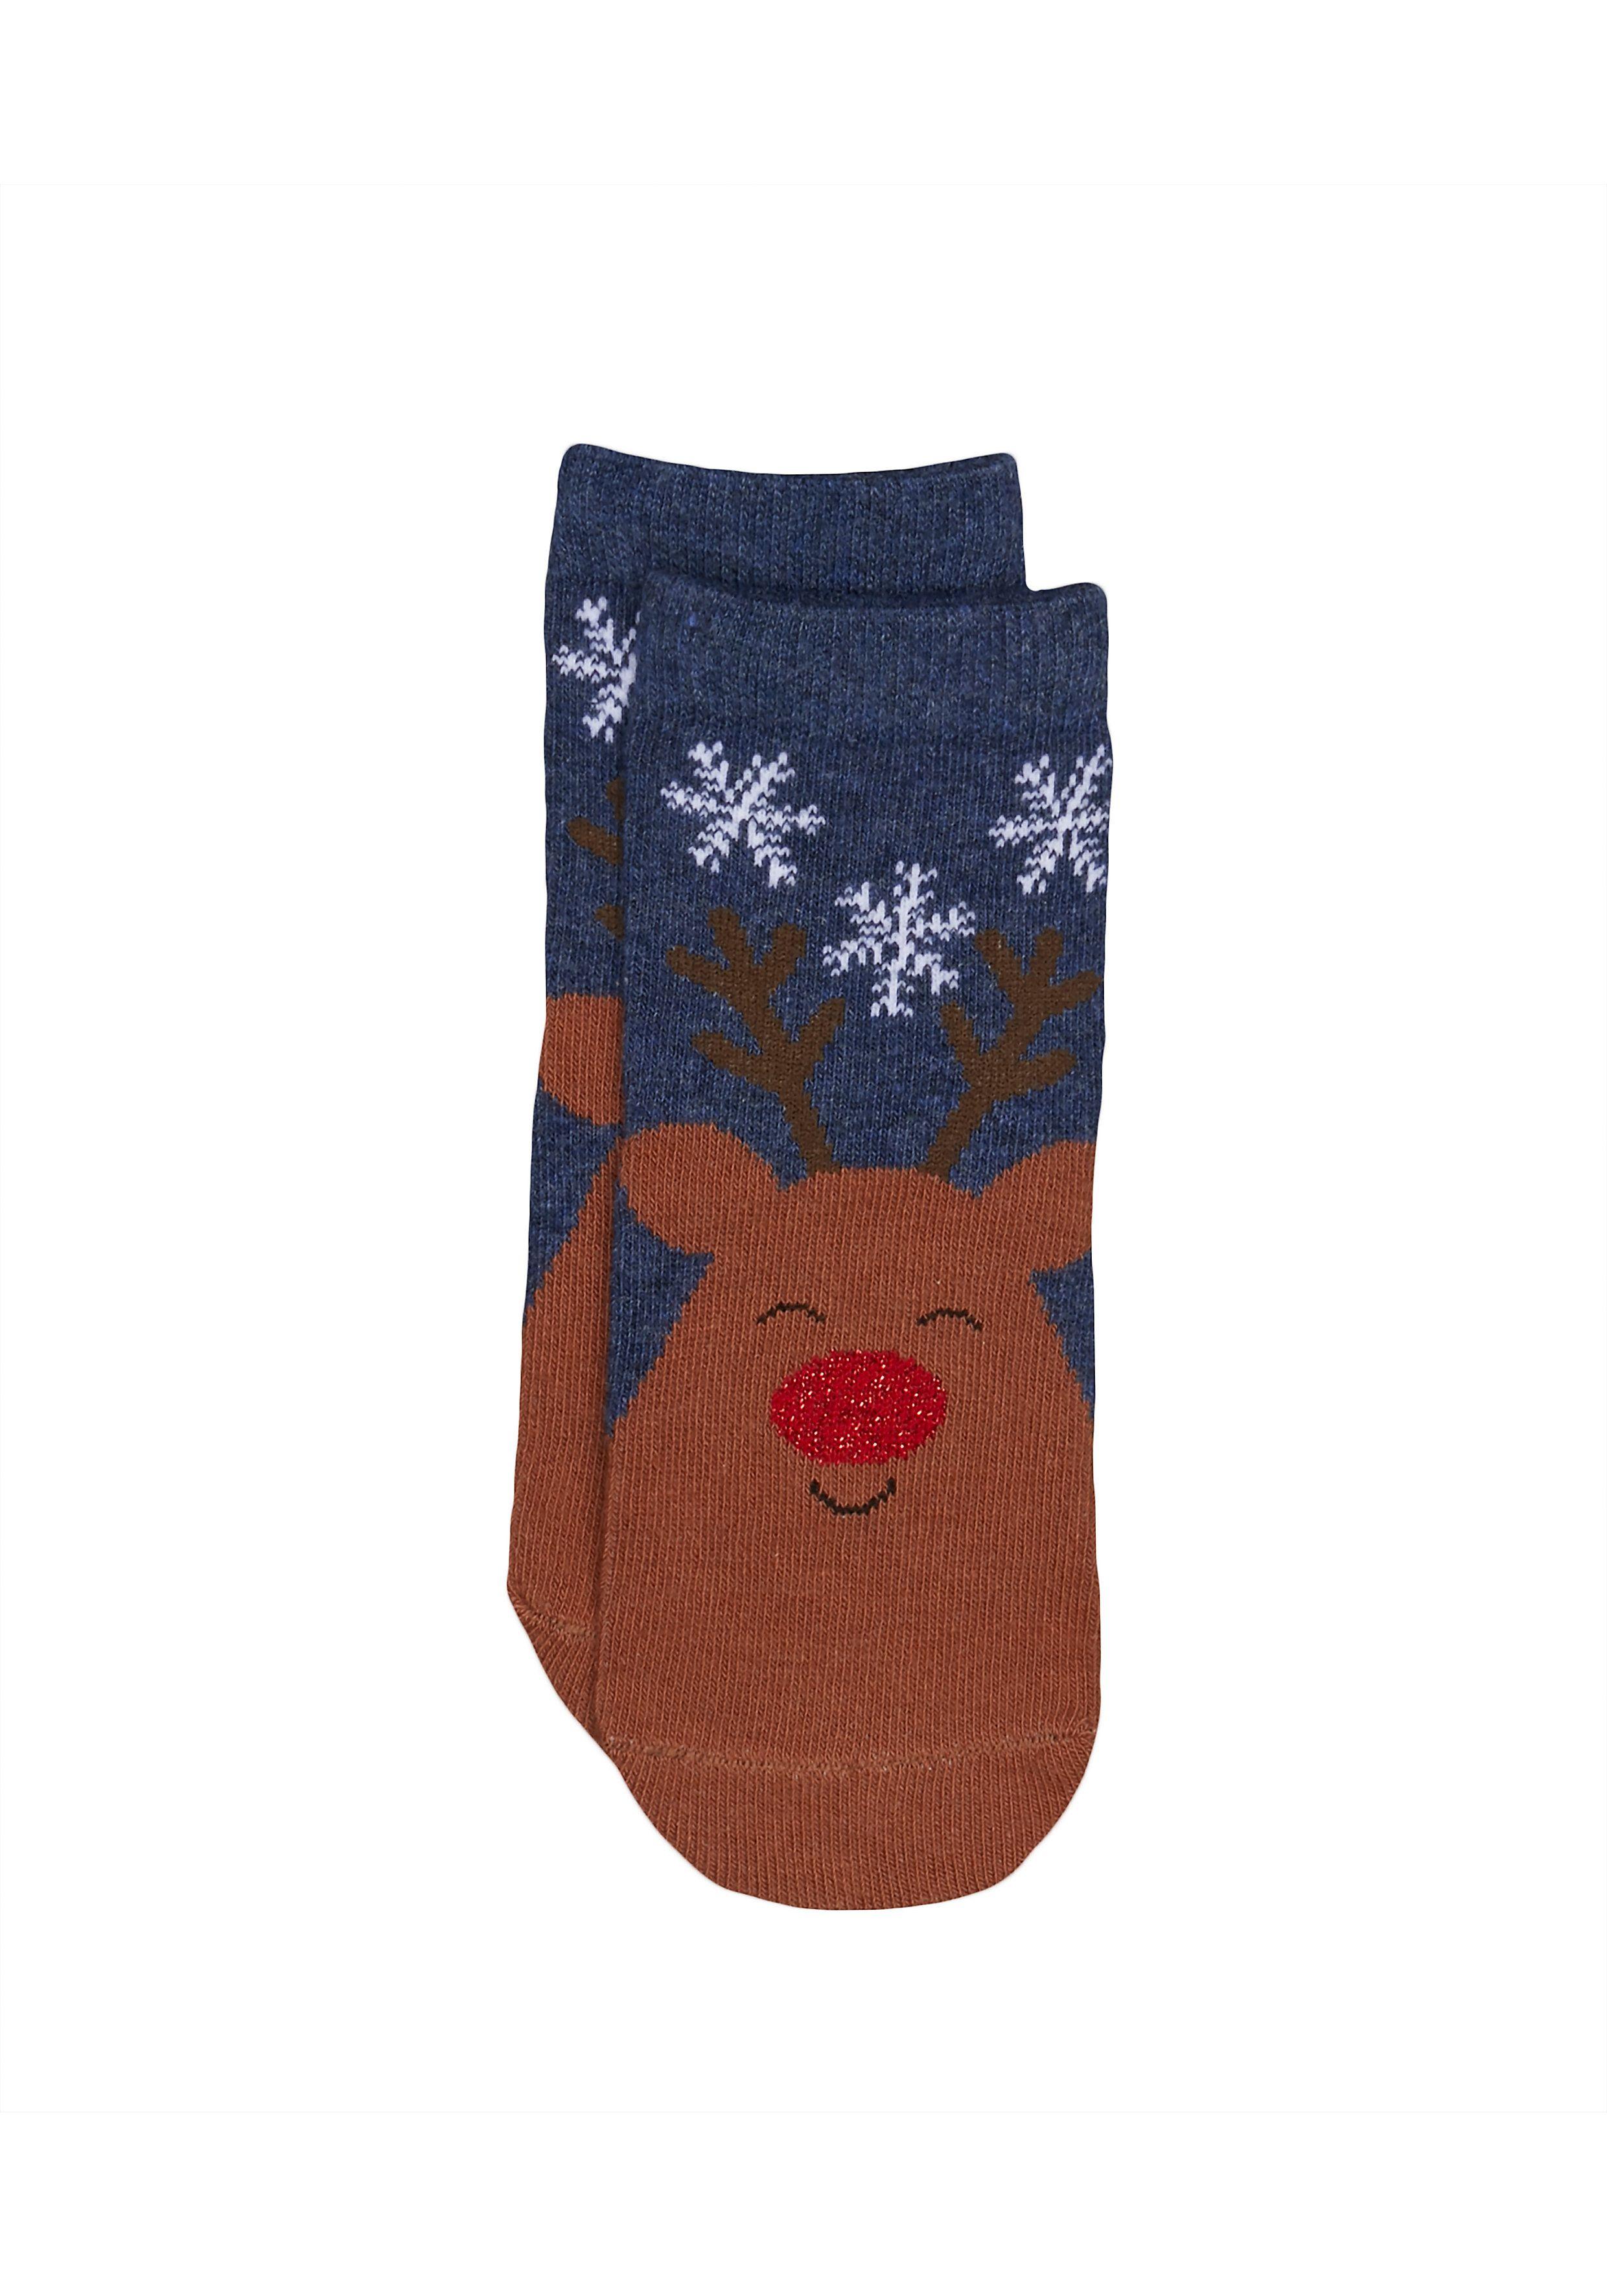 Mothercare | Unisex Reindeer Socks - Blue